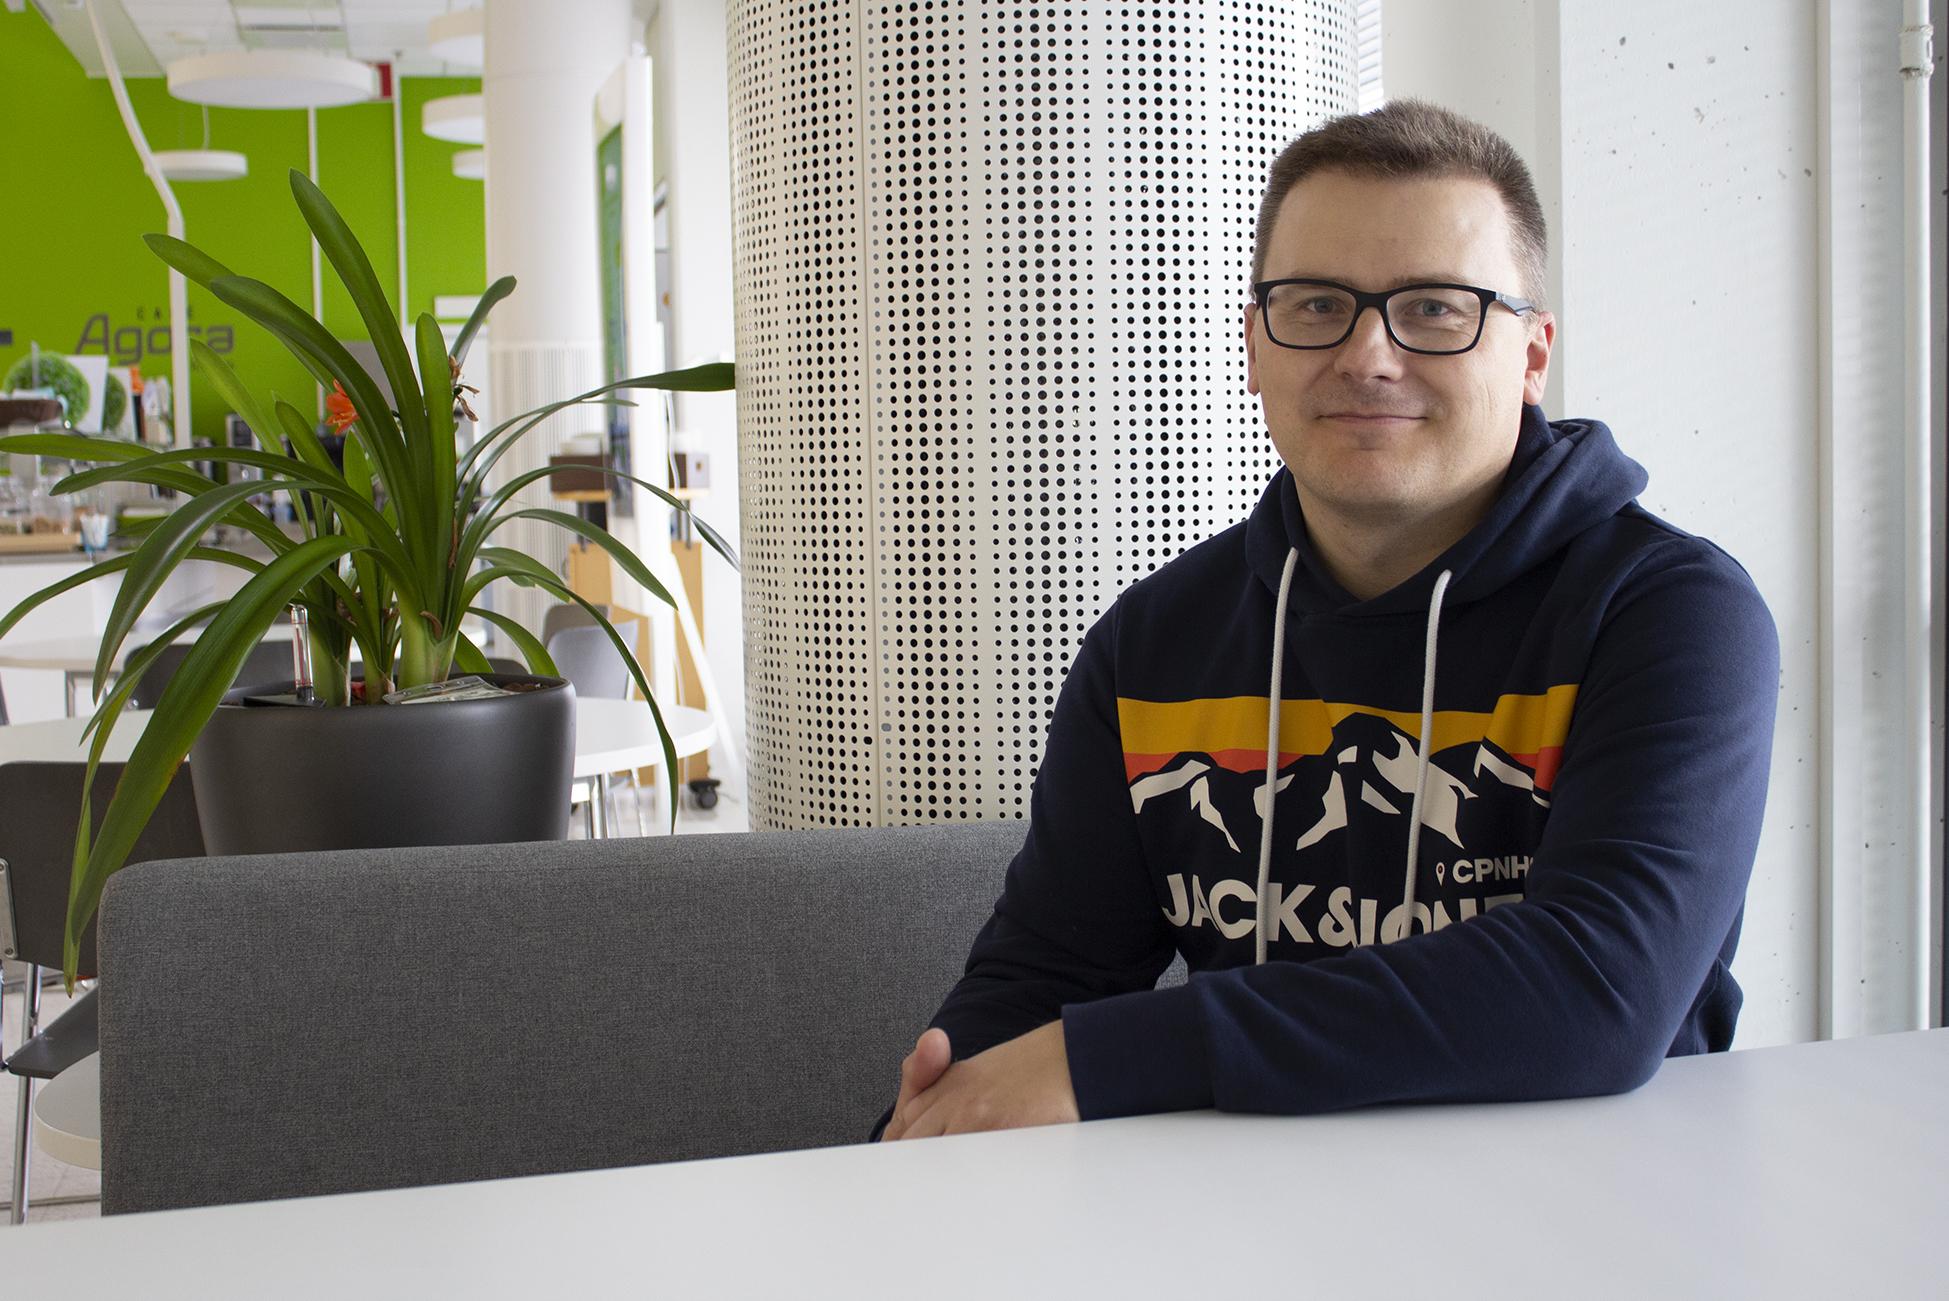 Tutkija Petri Linna, kuvituskuva